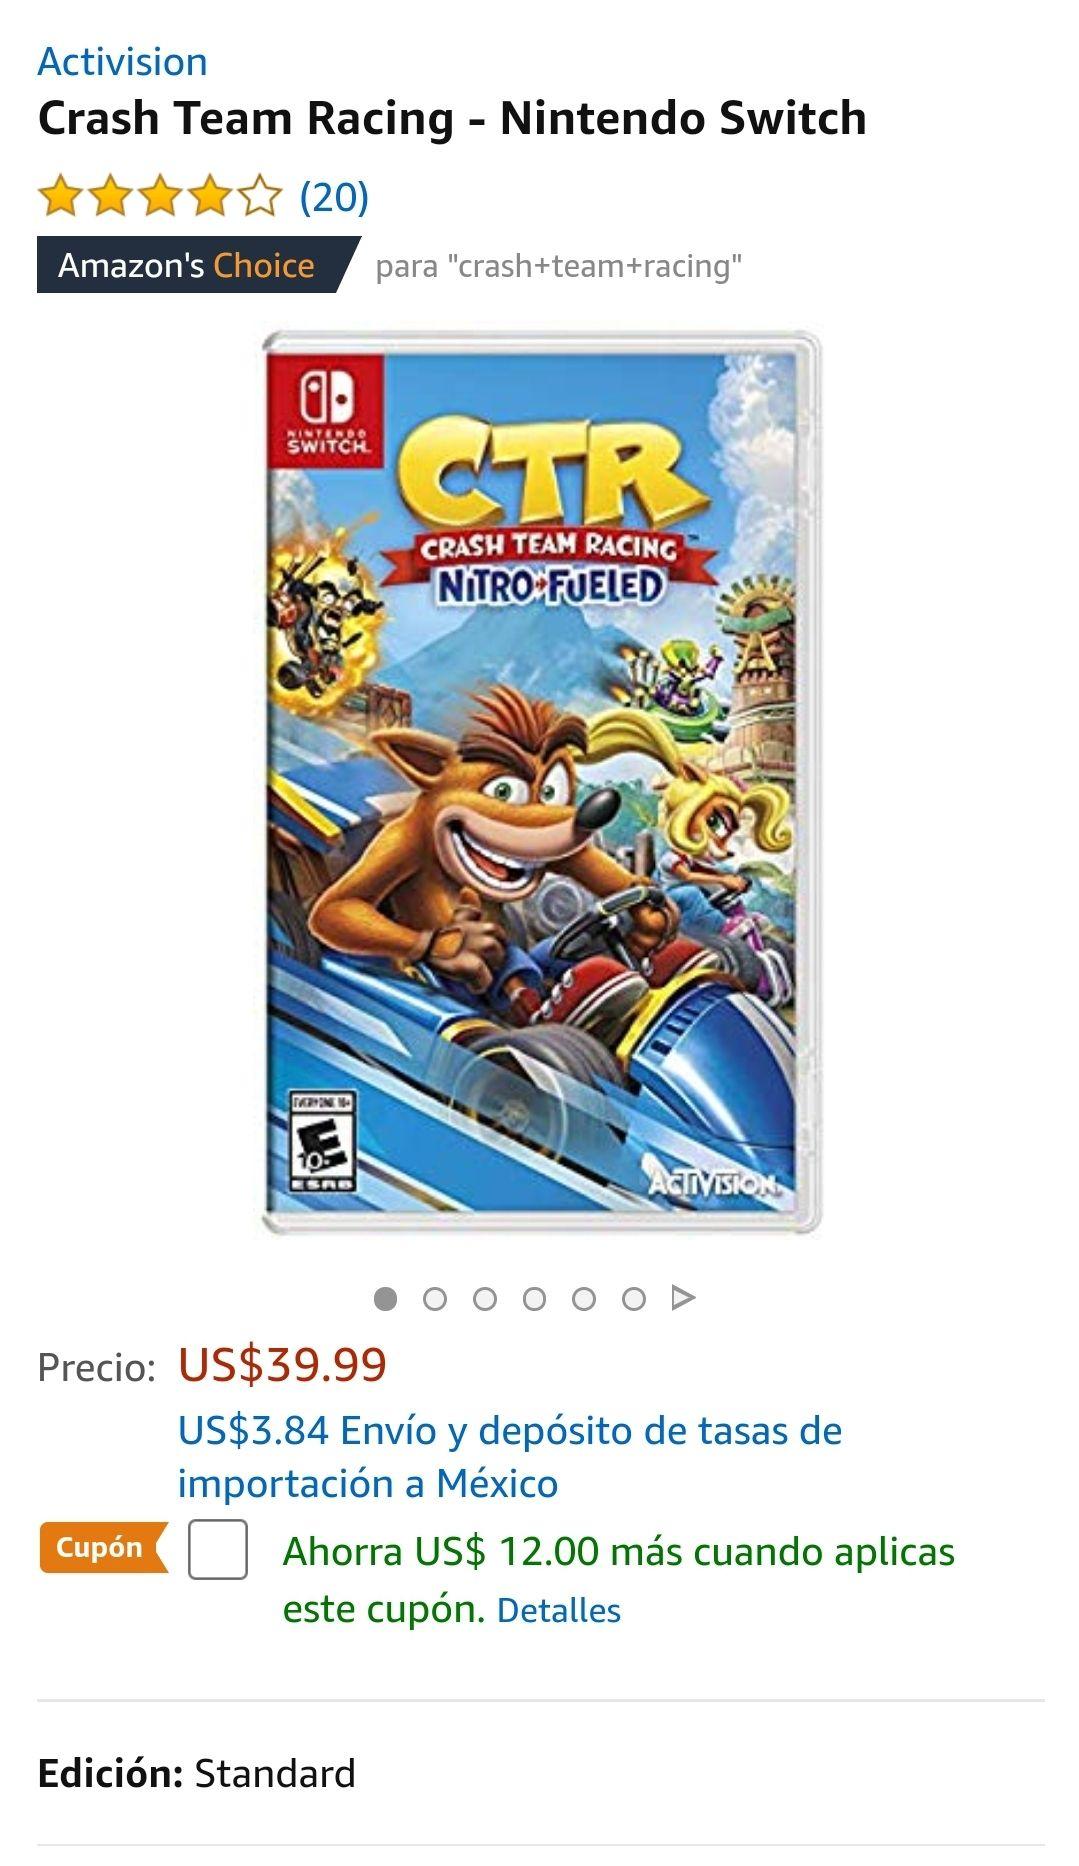 Amazon USA: Crash Team Racing - Nitro Fueled (Nintendo Switch)